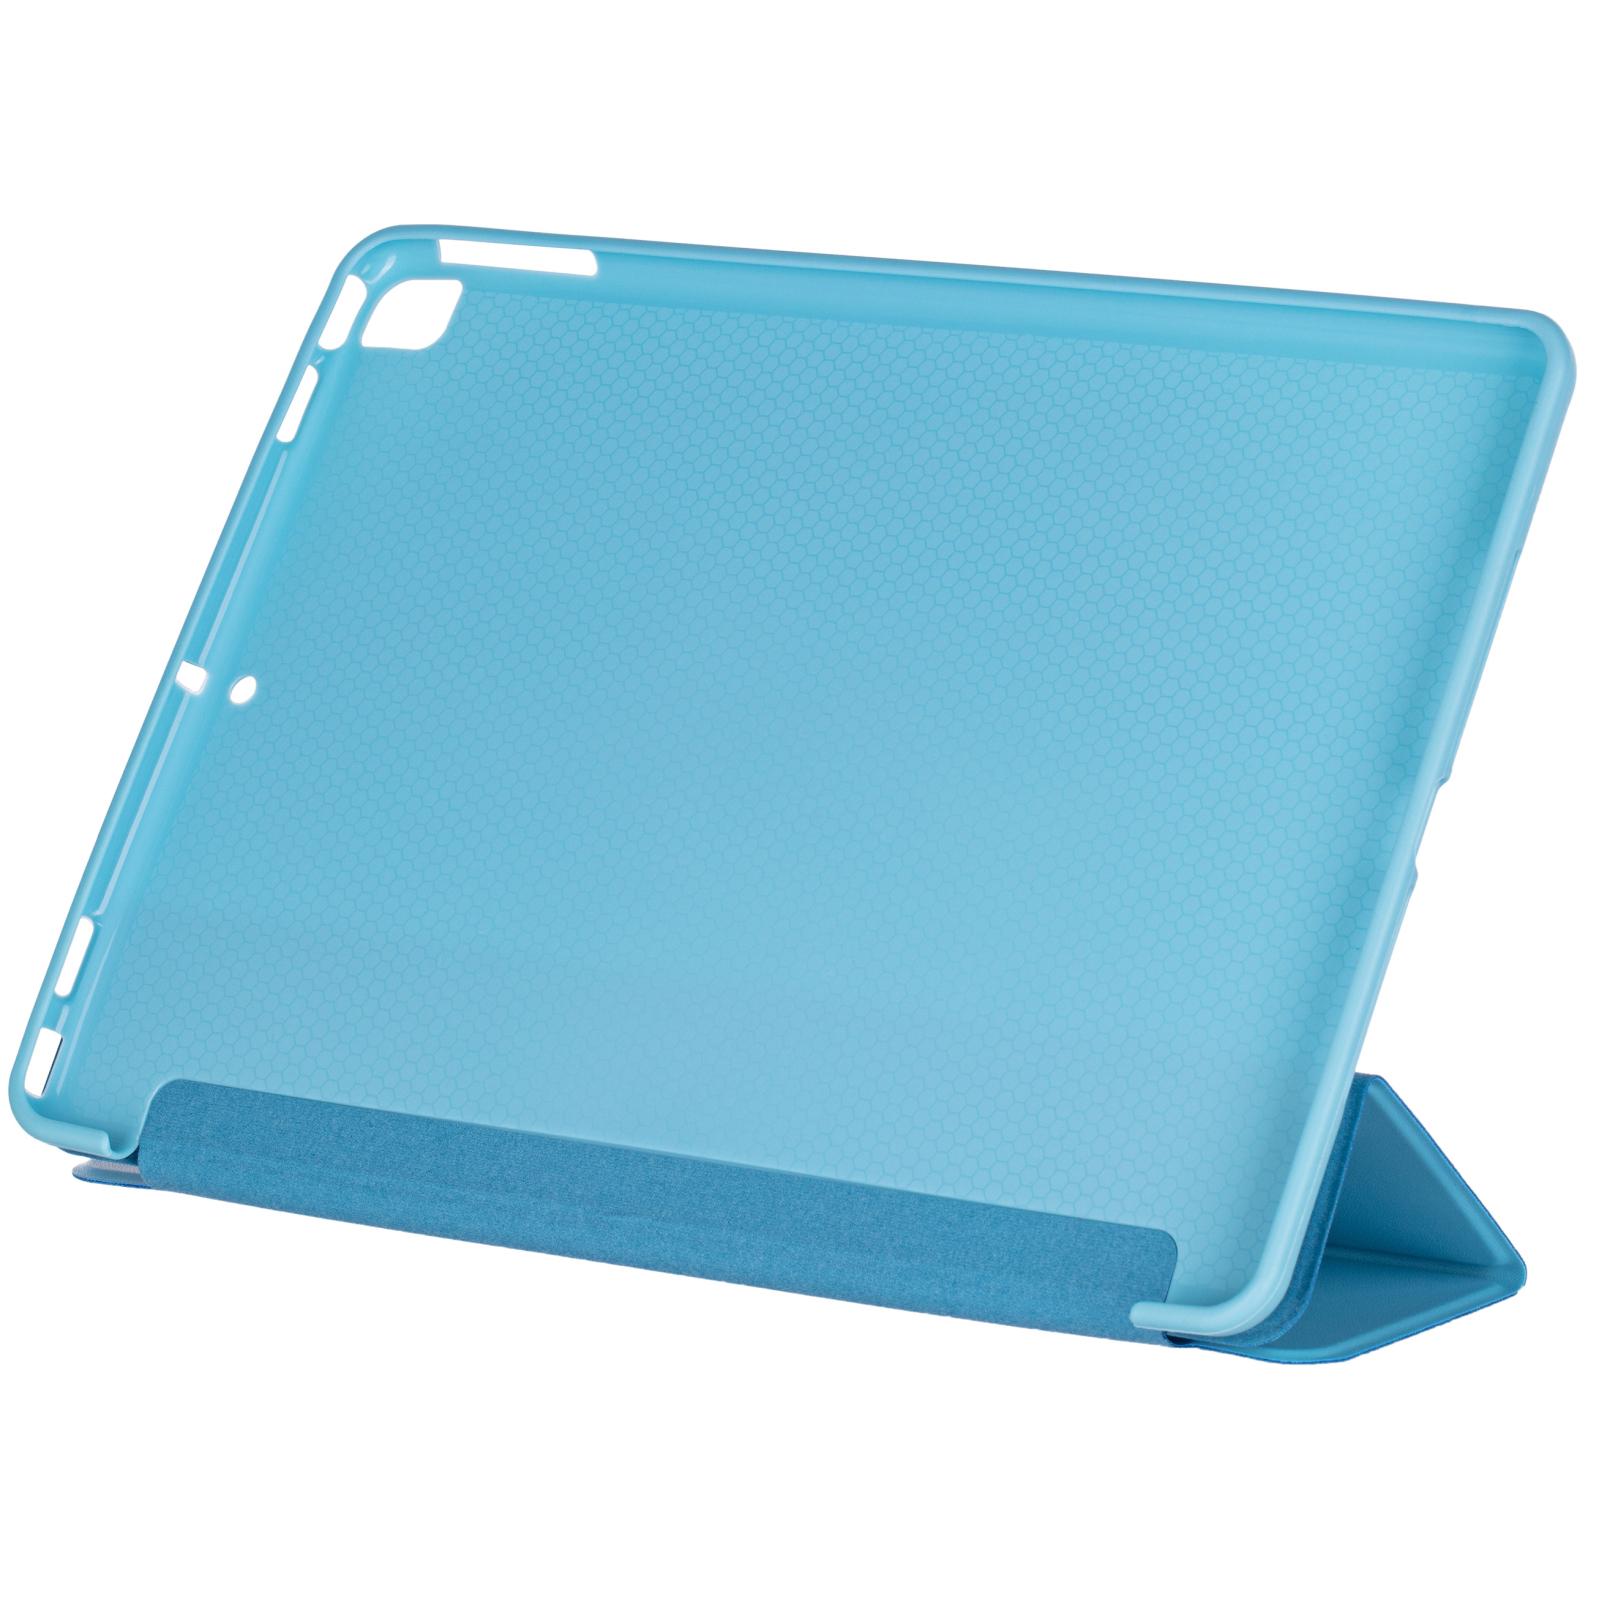 Чохол до планшета 2E Basic Apple iPad 10.2` 2019, Flex, Red (2E-IPAD-10.2-19-IKFX-RD) зображення 3